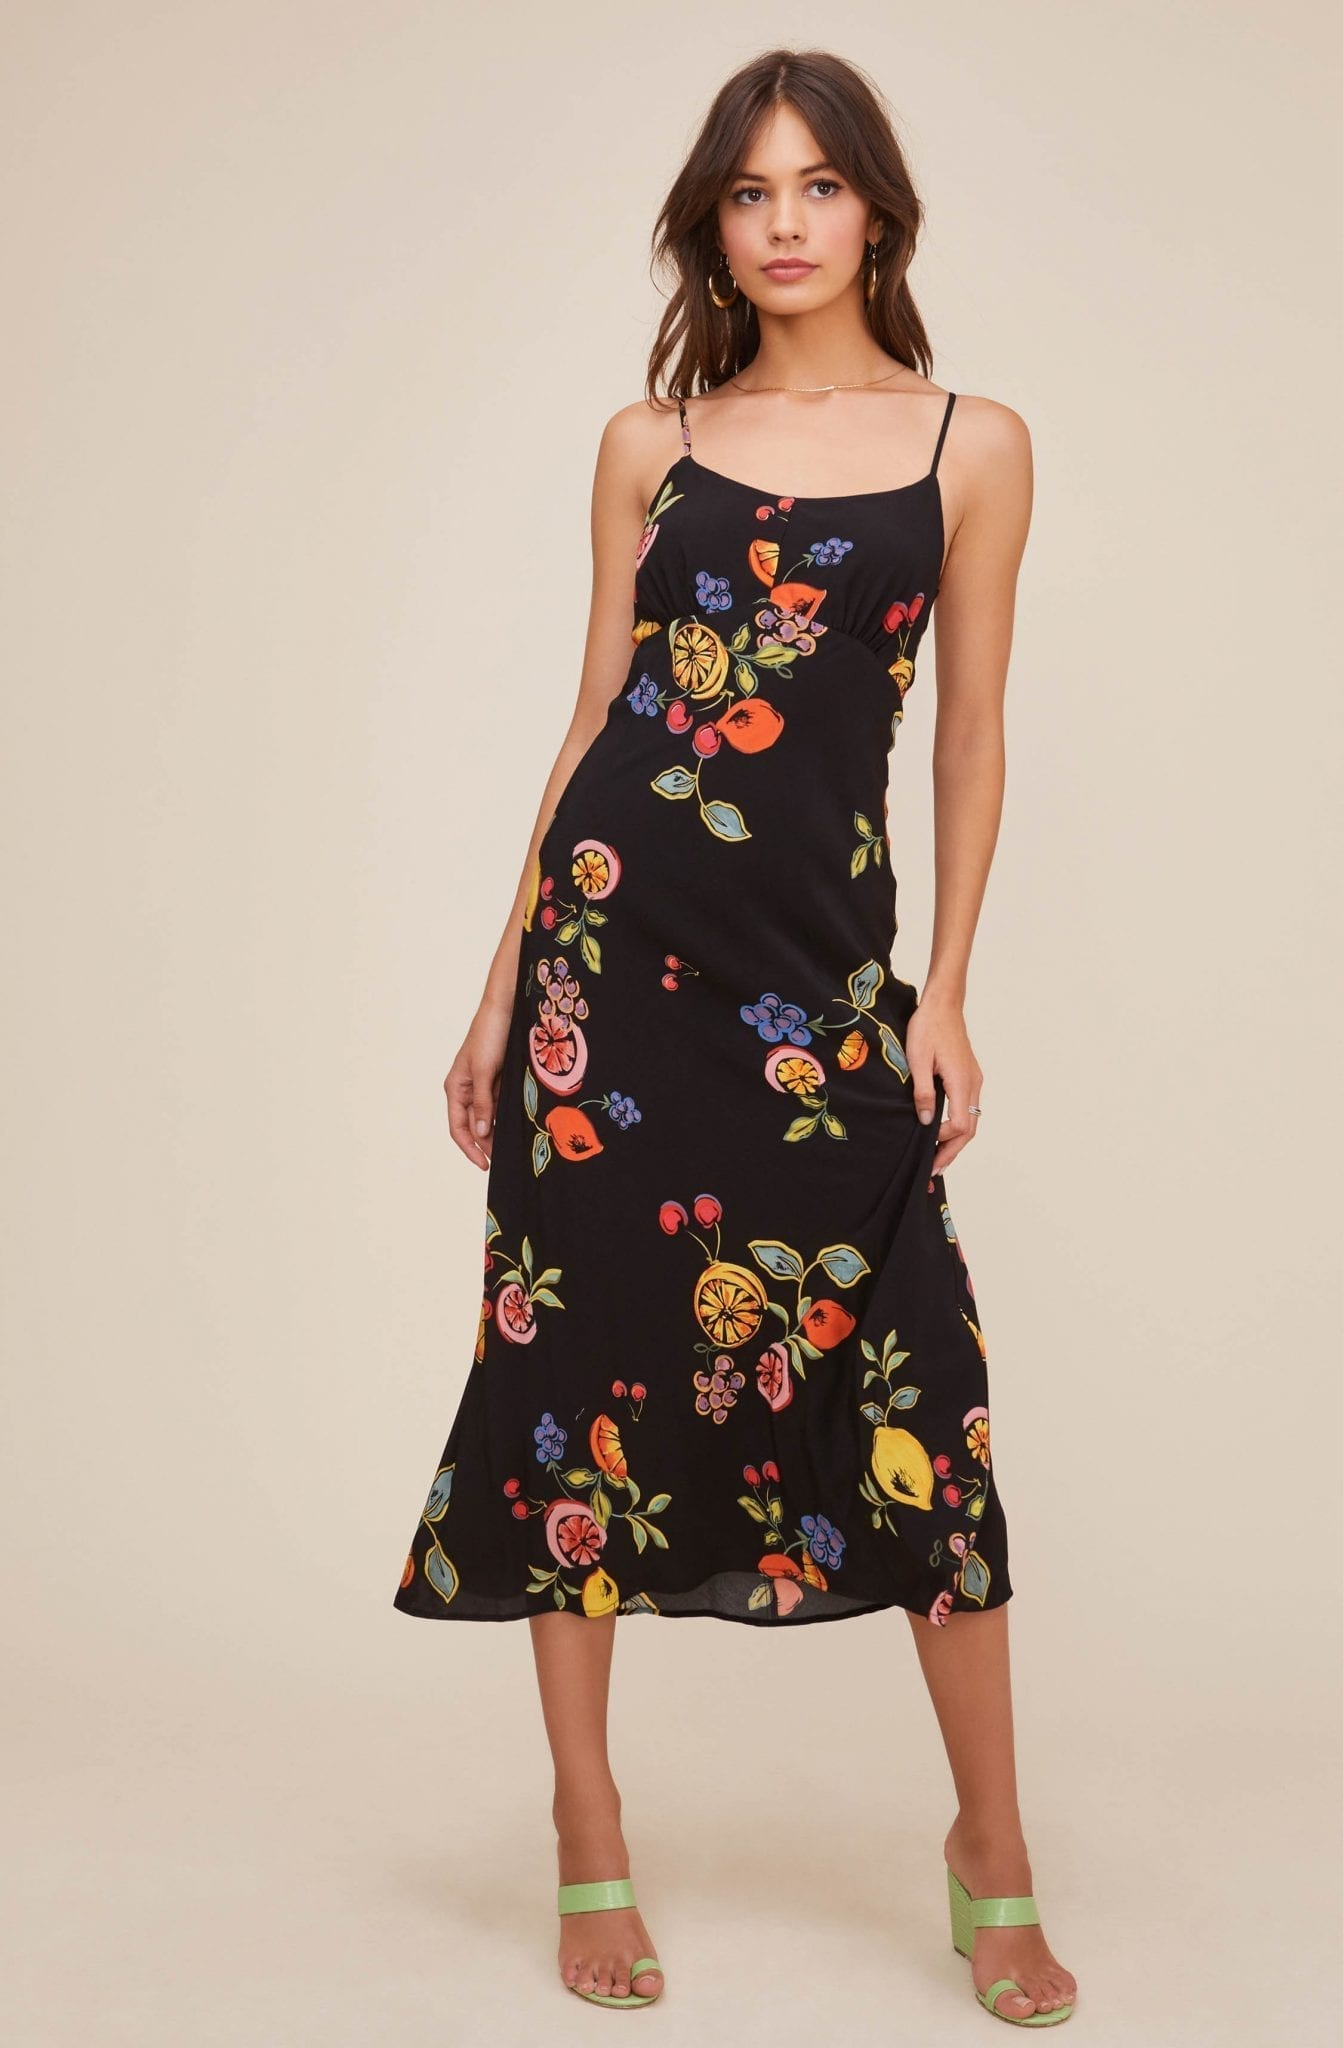 ASTRTHELABEL Charisma Fruit Midi Dress